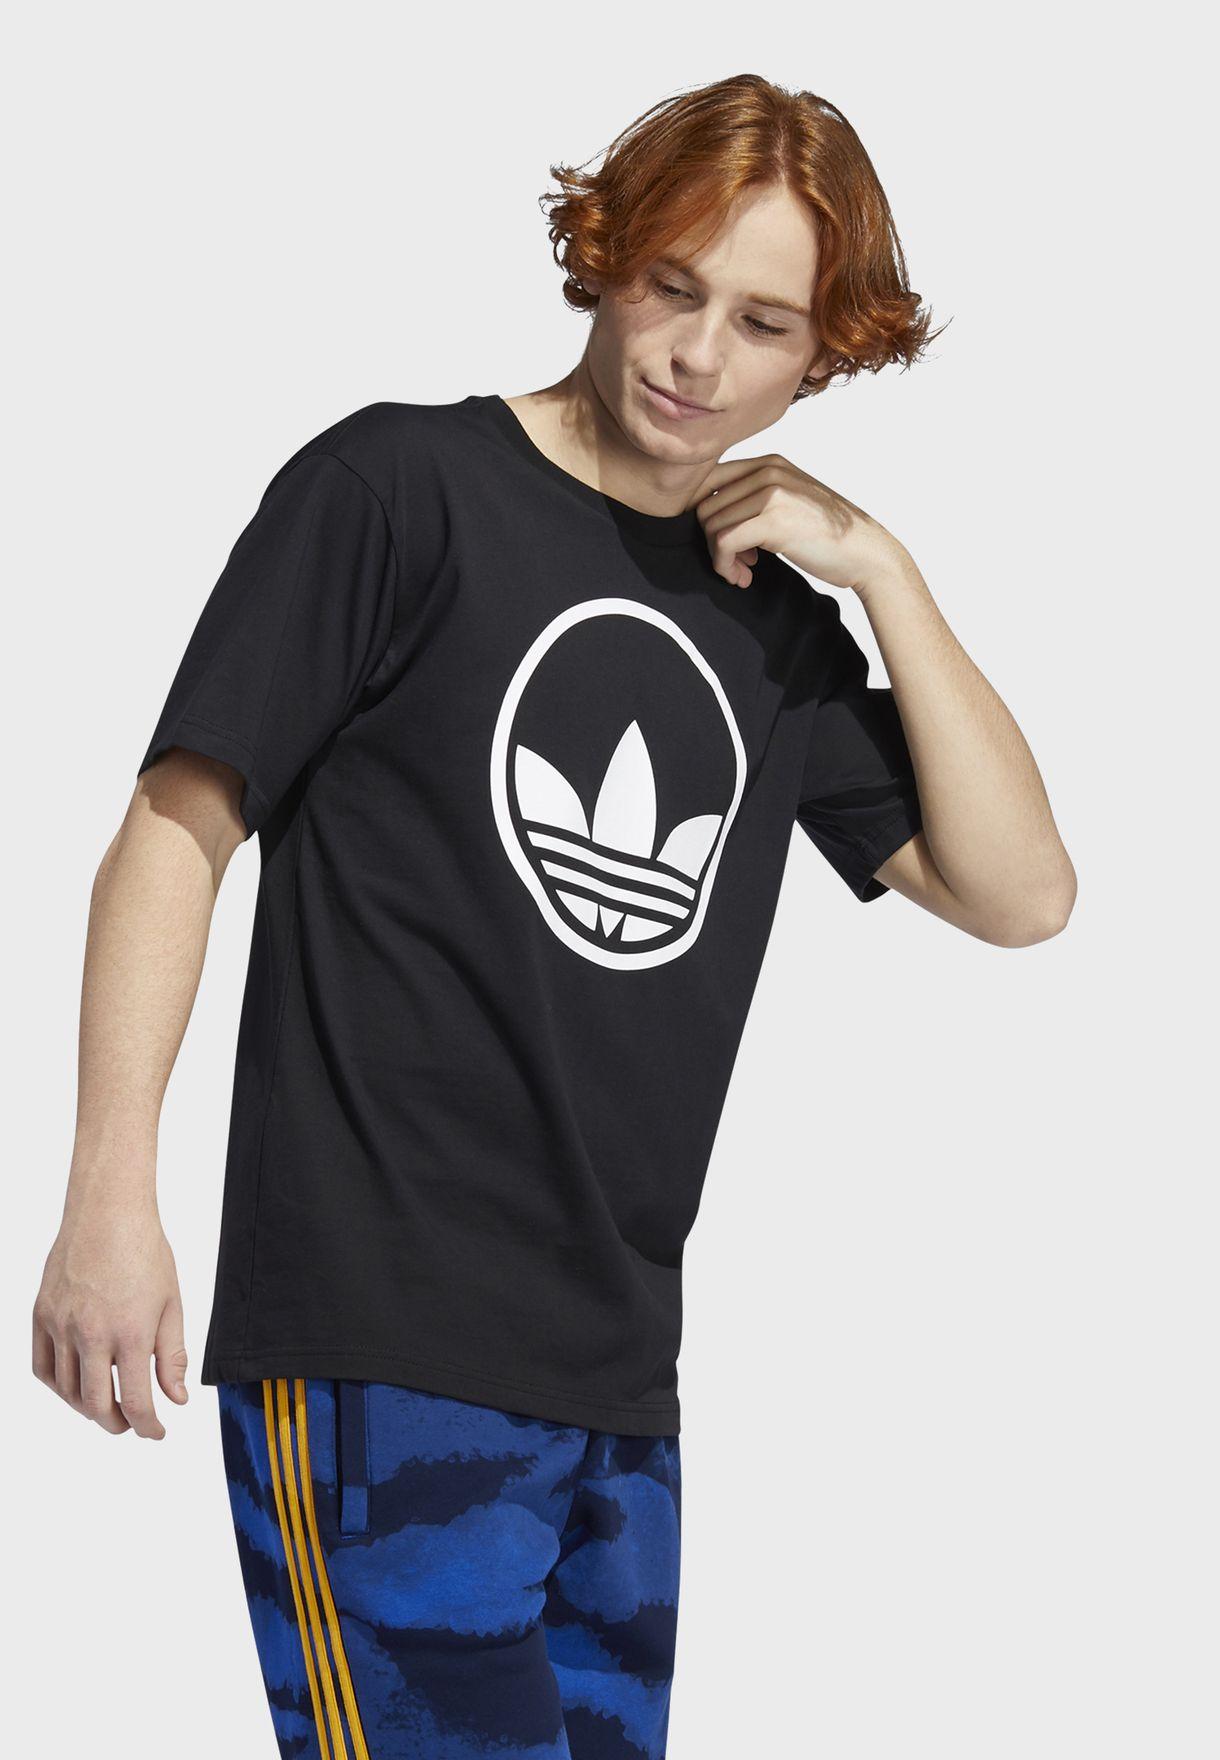 Circle Trefoil Graphics Casual Men's T-Shirt